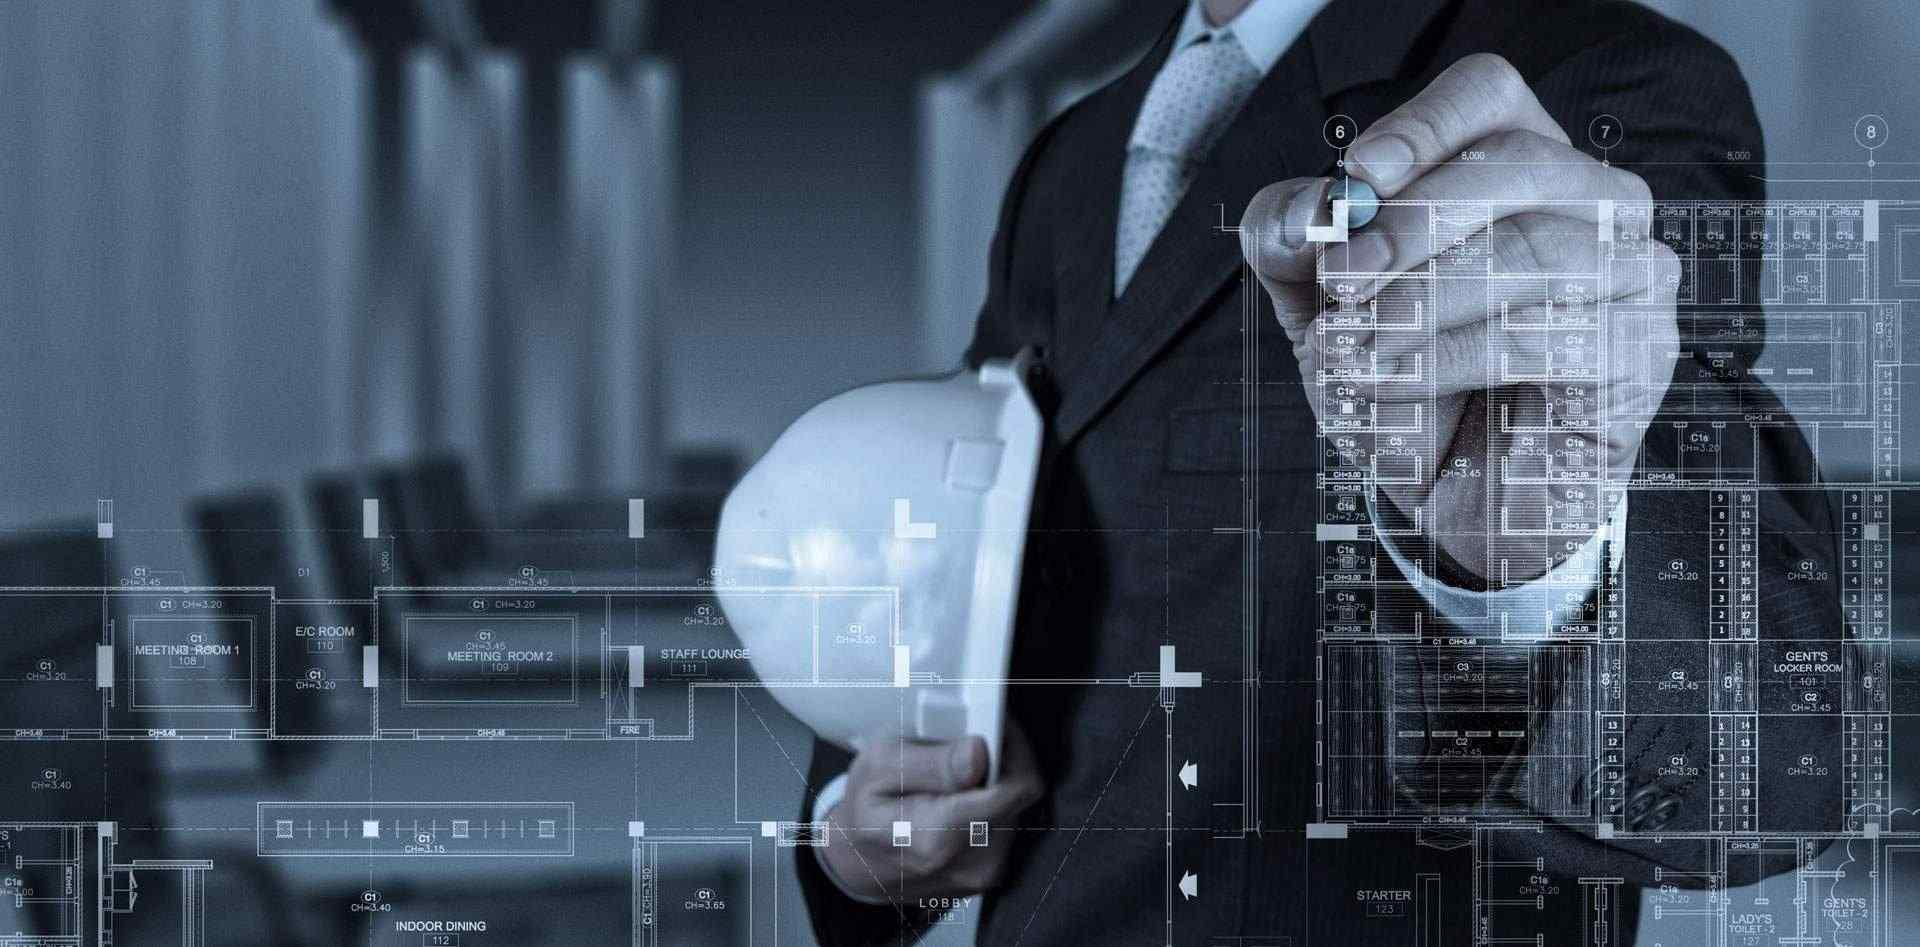 Cical ingénieurs industrie